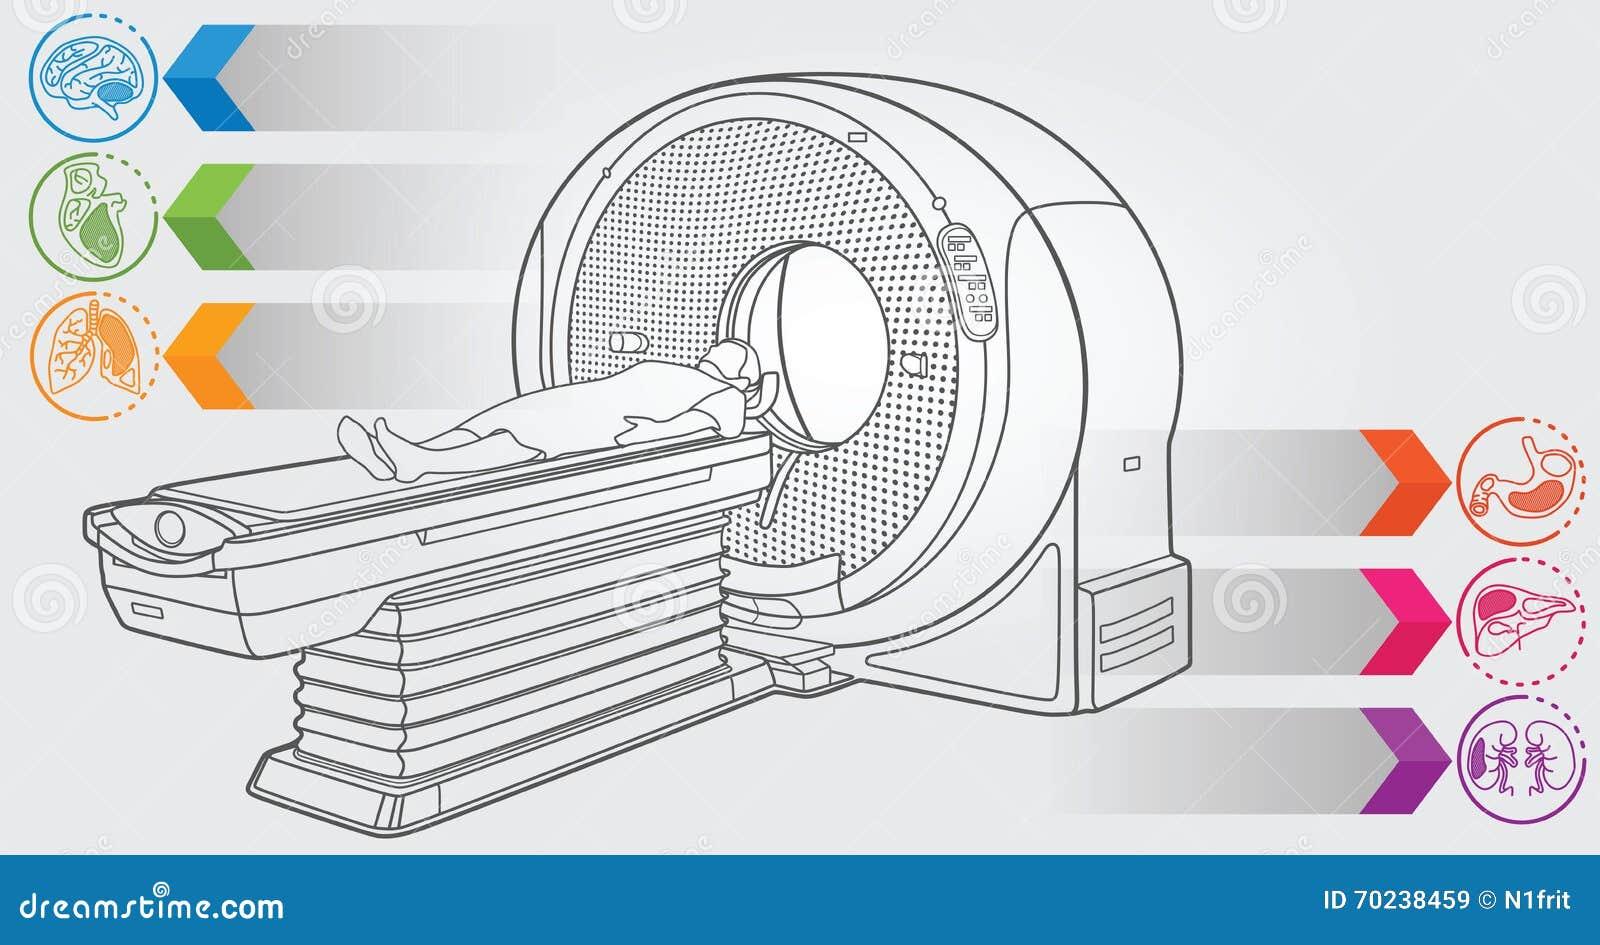 Line Art Printing And Design : Mri diagnostic stock vector image